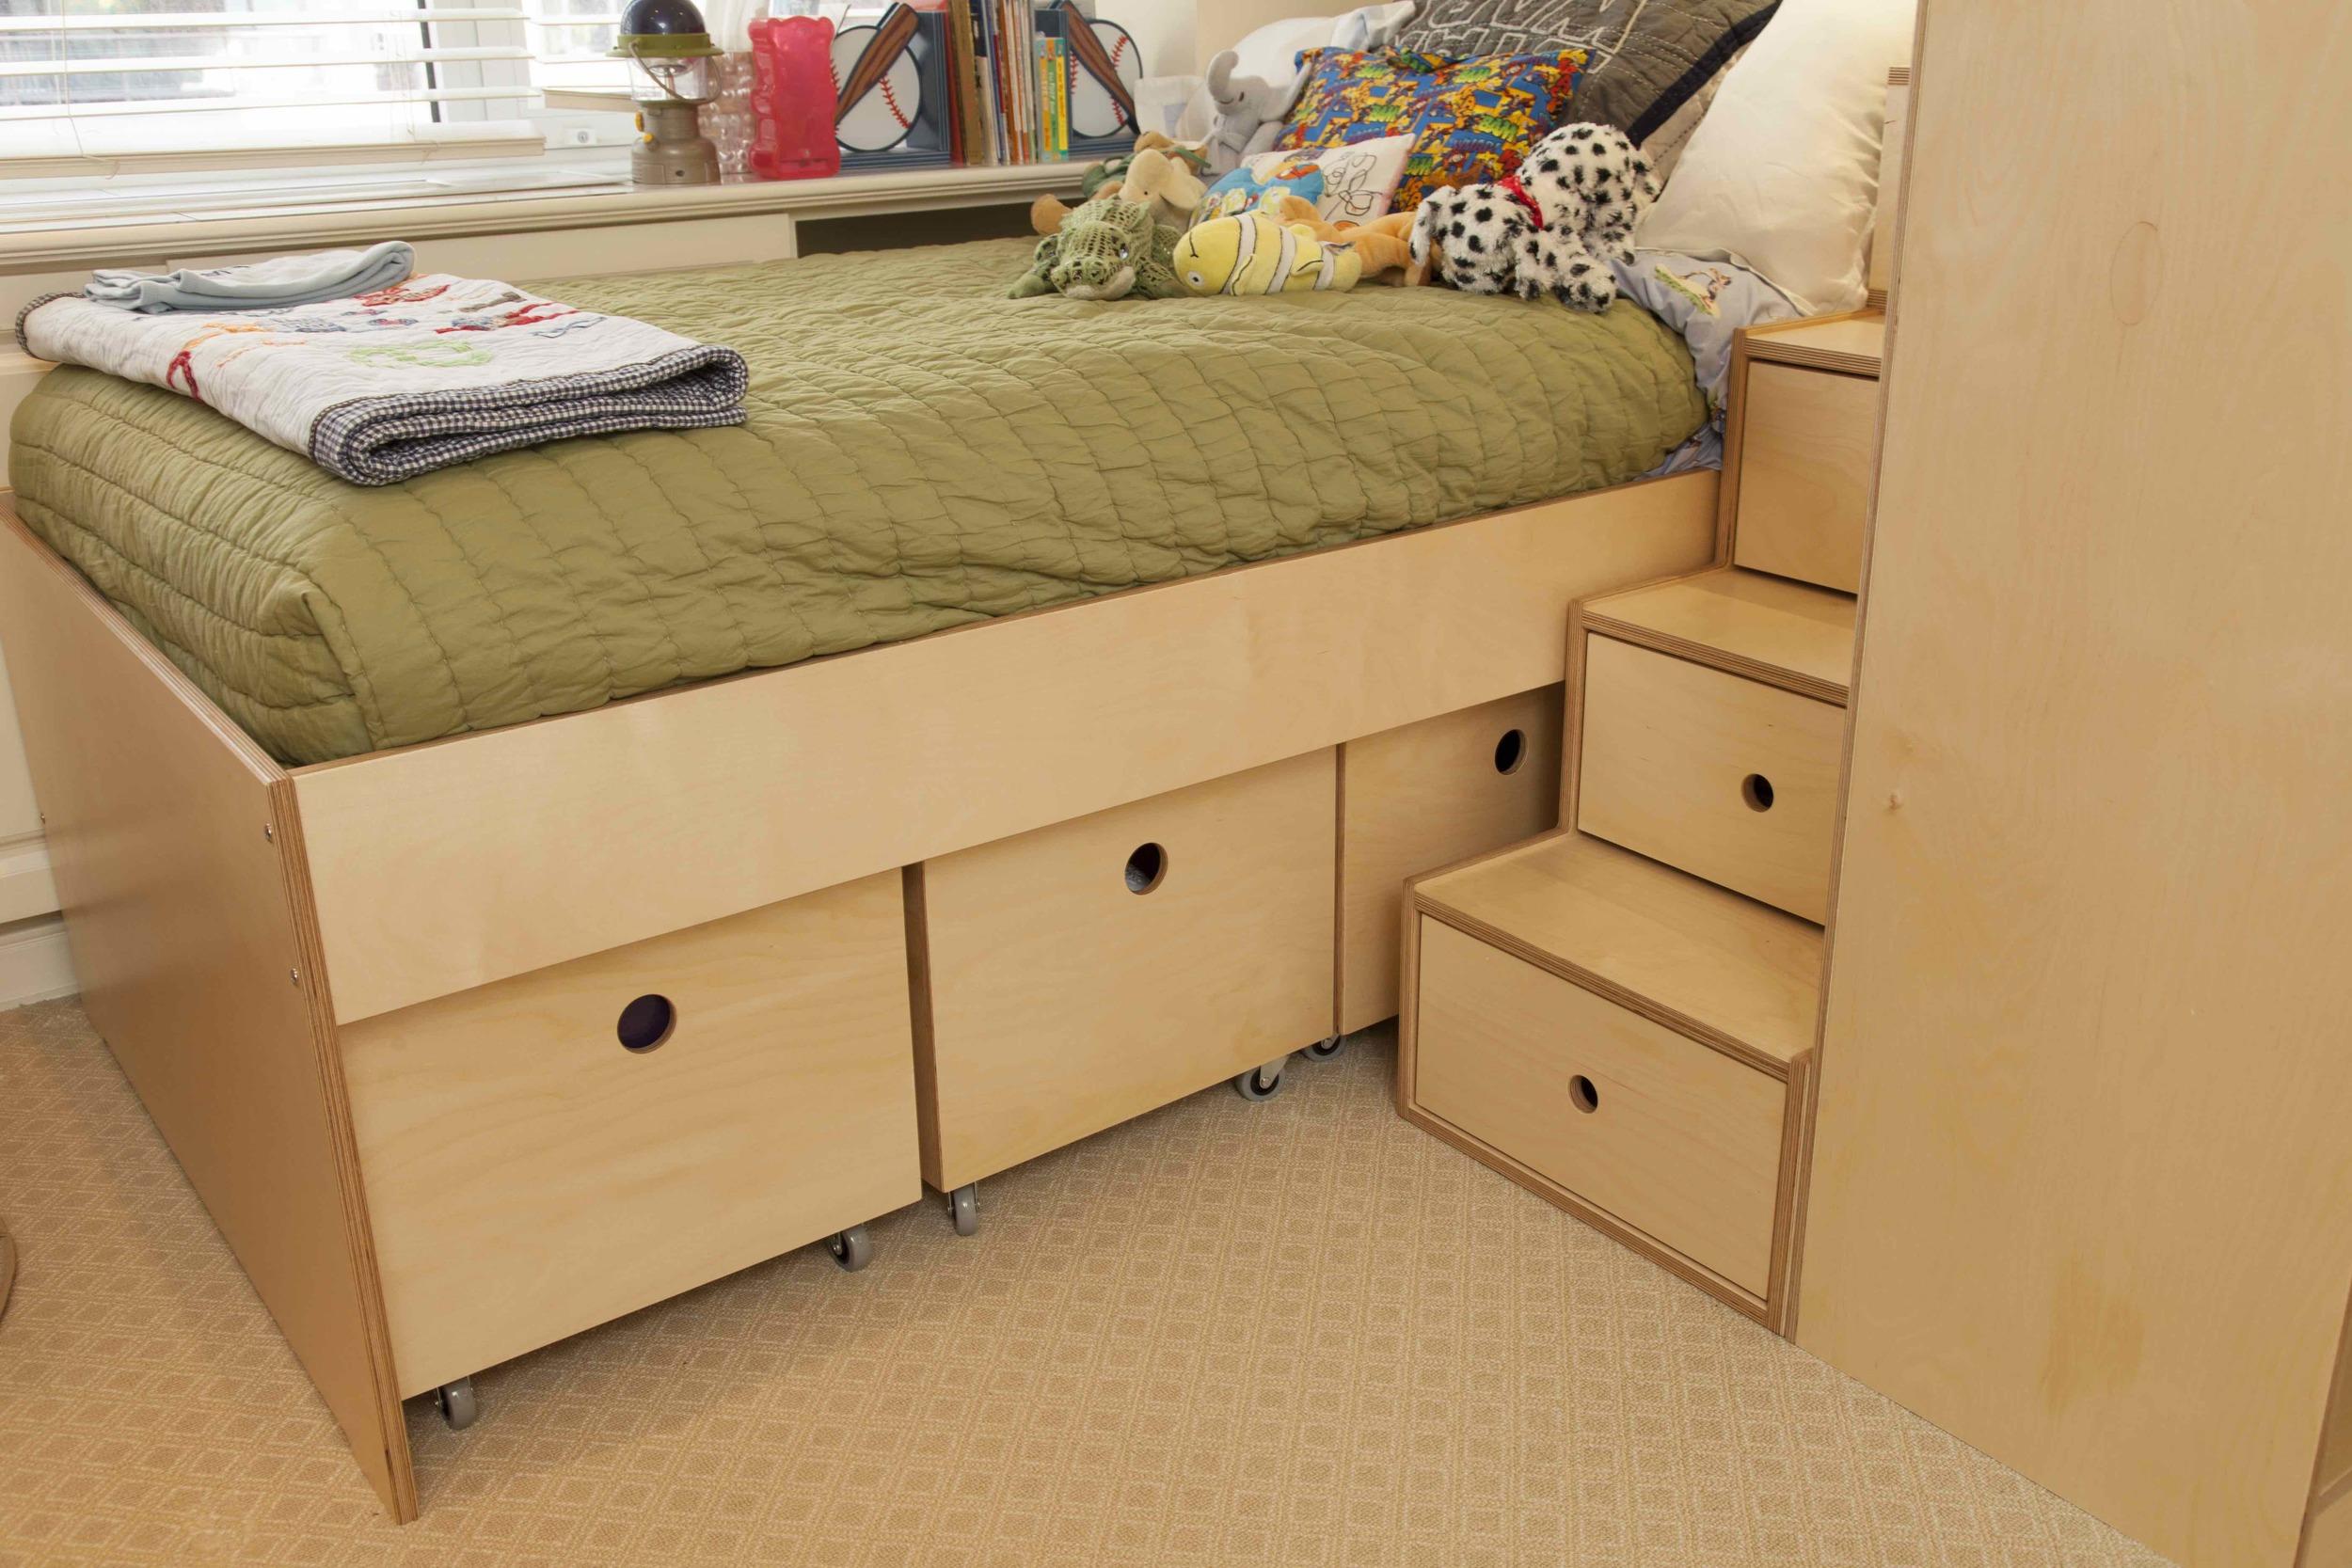 casa kids-storage on wheels- kids furniture